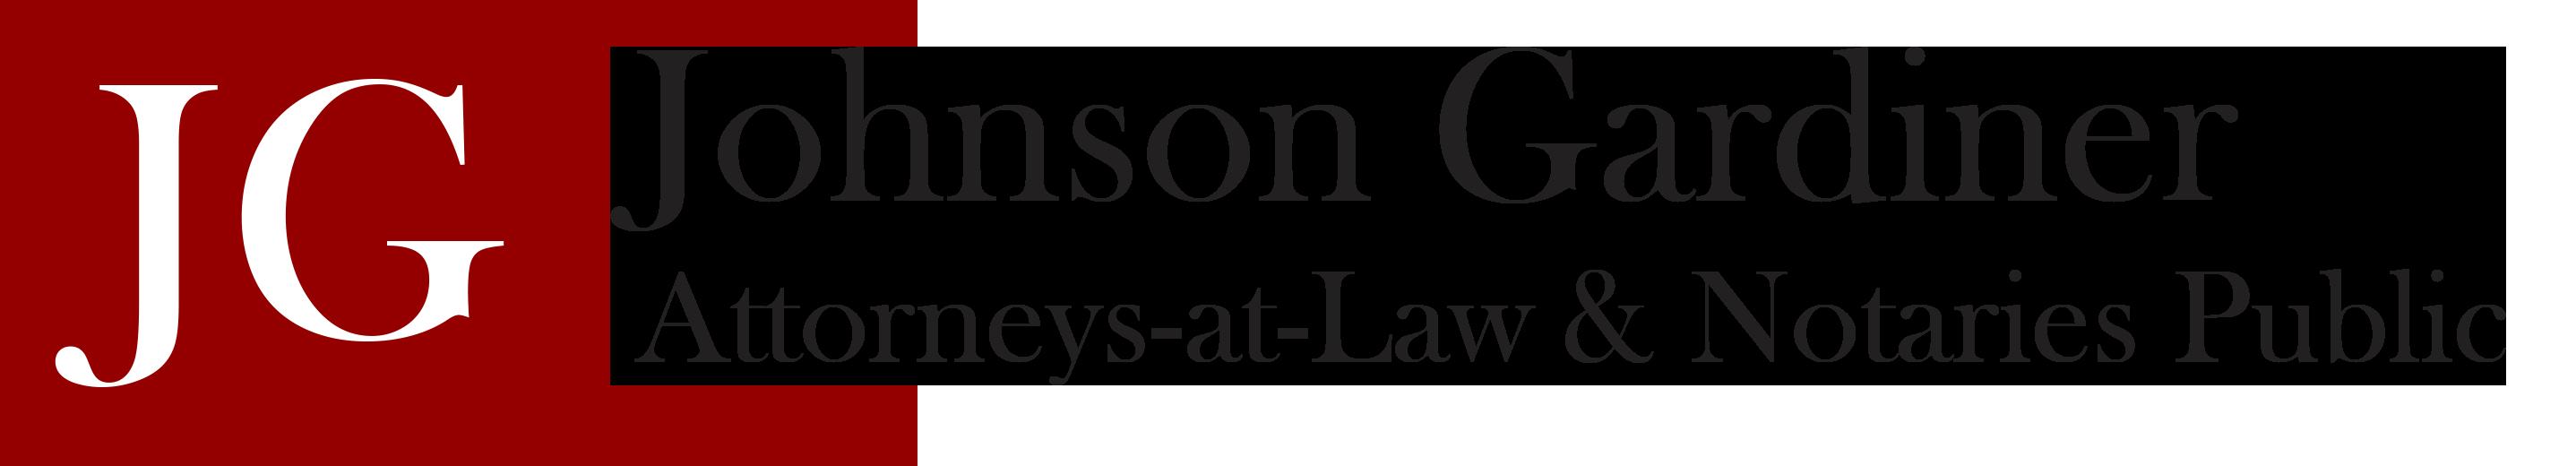 Johnson Gardiner, Attorneys At Law & Notaries Public